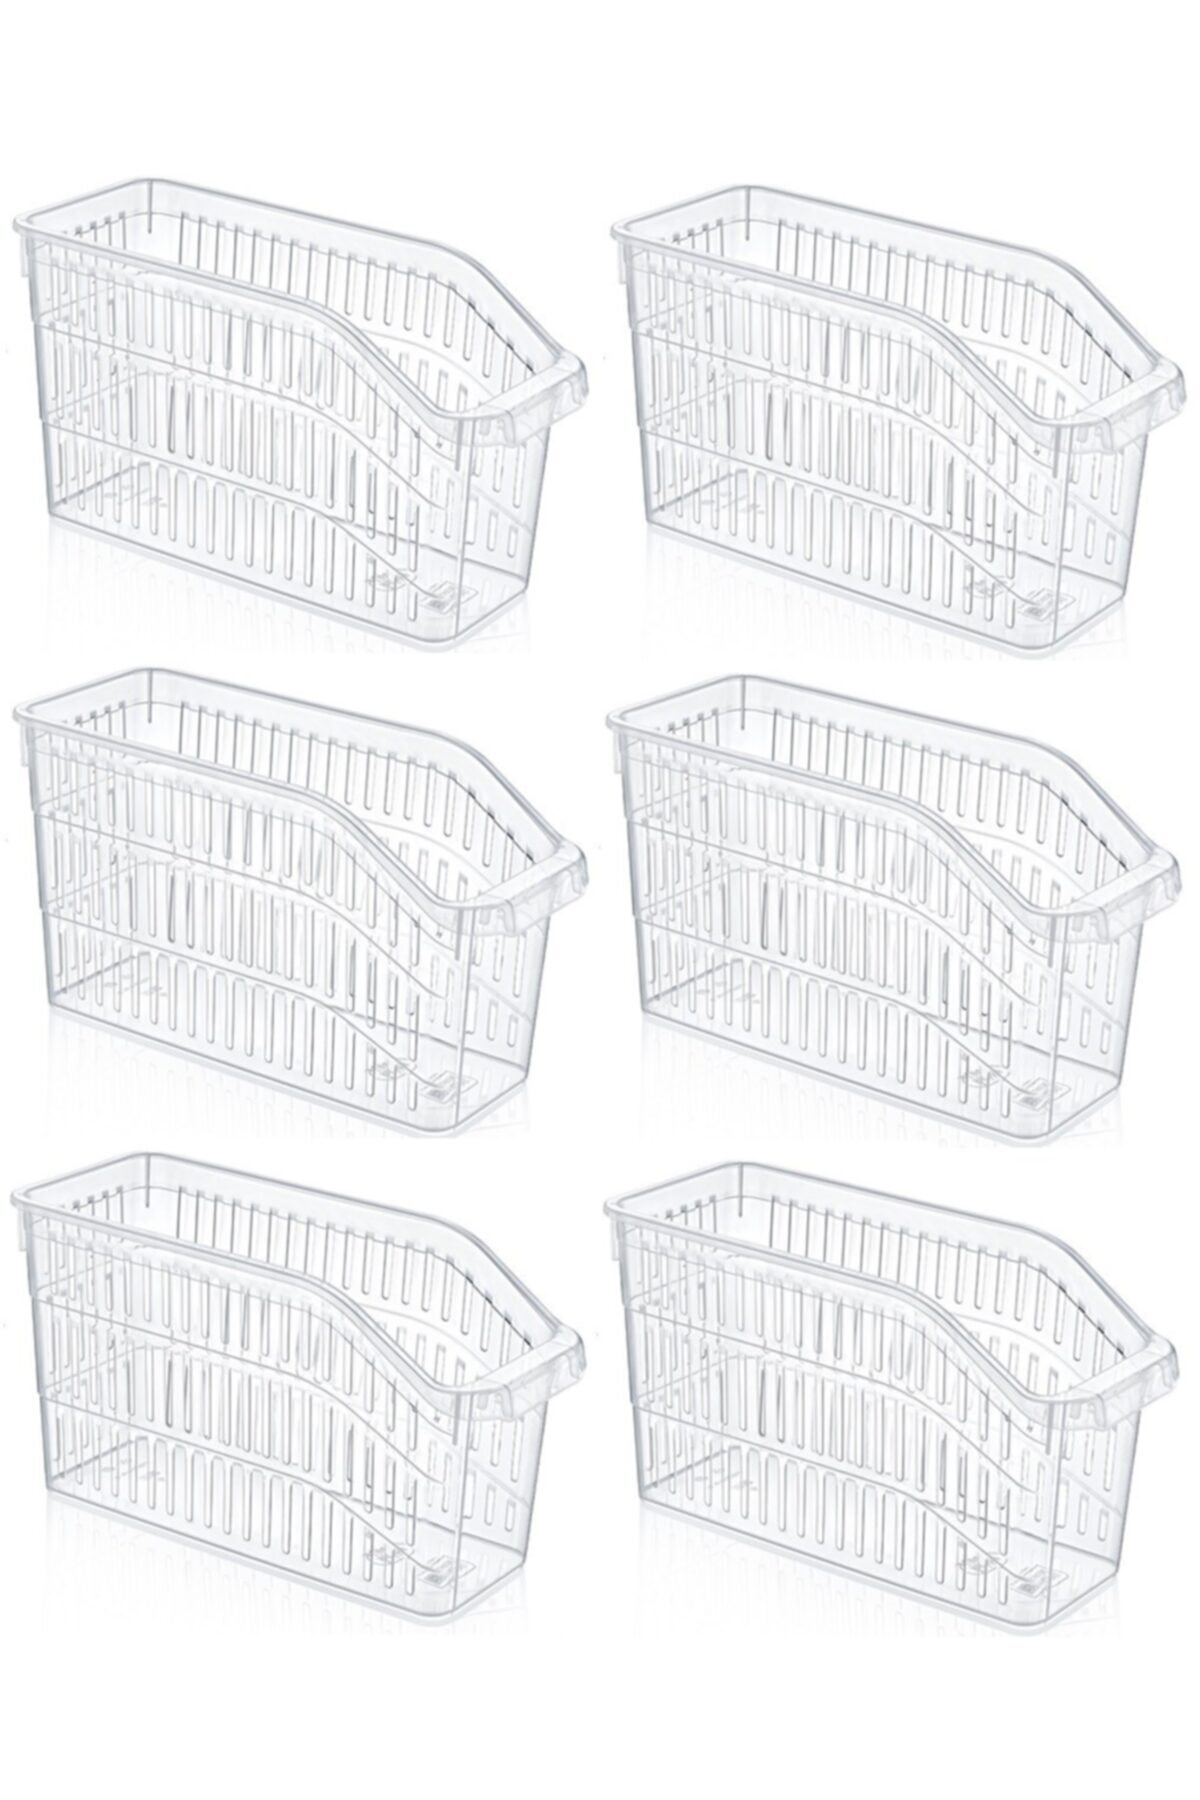 Sas Buzdolabı Sepeti Dolap Içi Düzenleyici Sepet Organizer Şeffaf 6 Adet 30x17x16 1